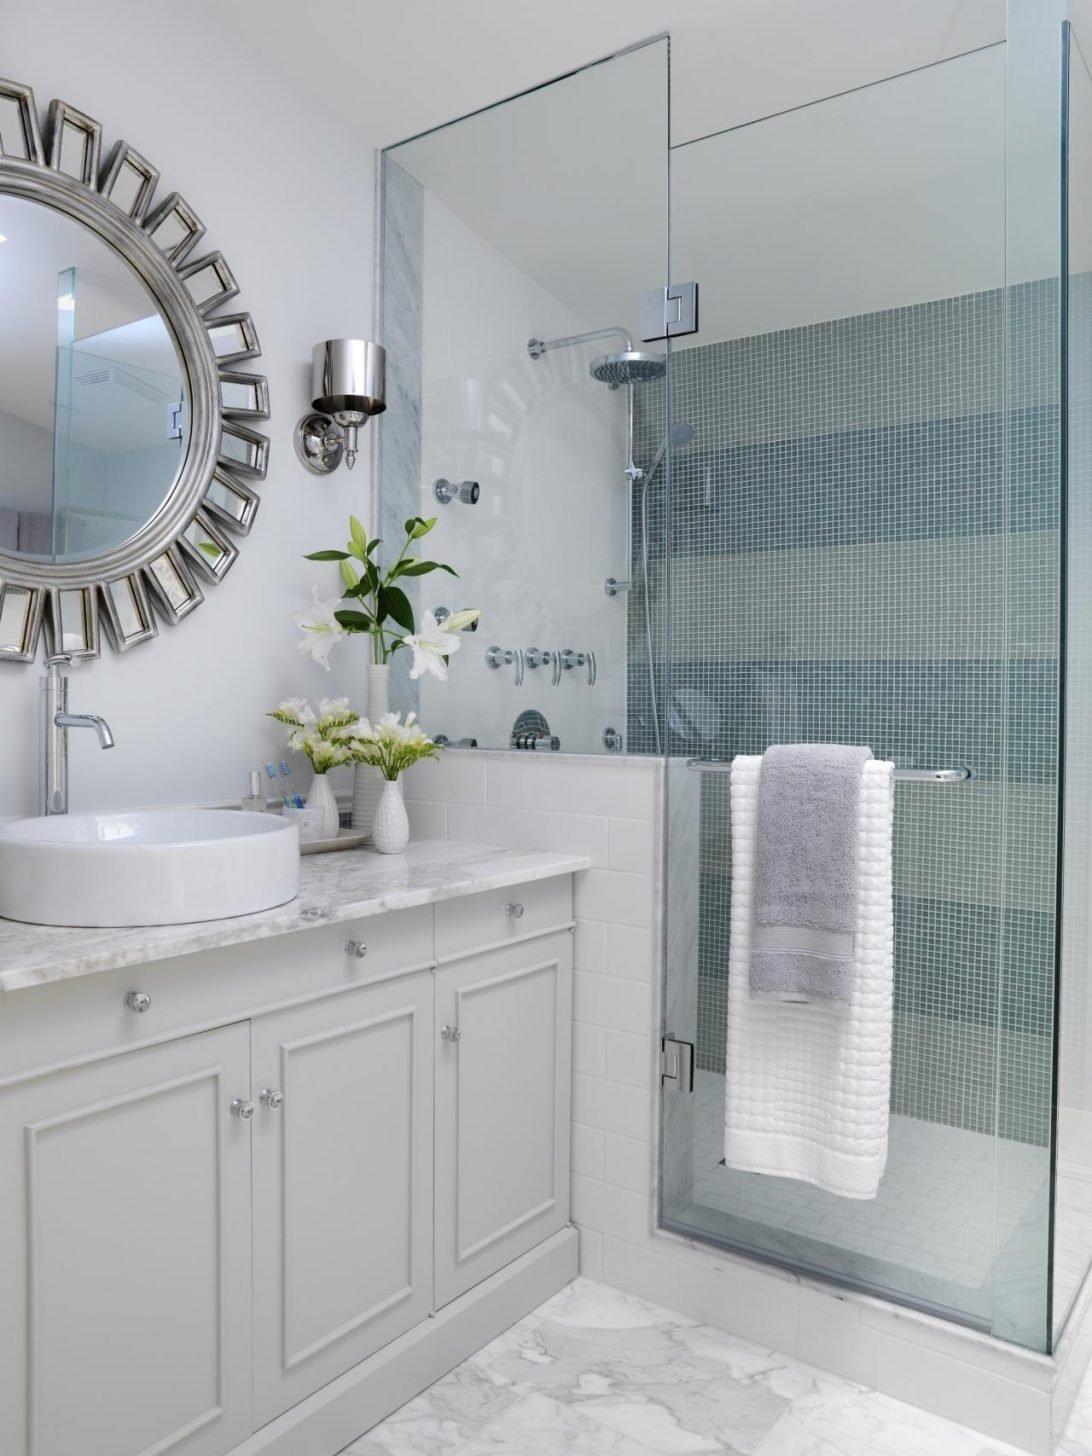 10 Unique Tile Ideas For Small Bathroom top 57 fantastic very small bathroom designs simple design ideas 2020